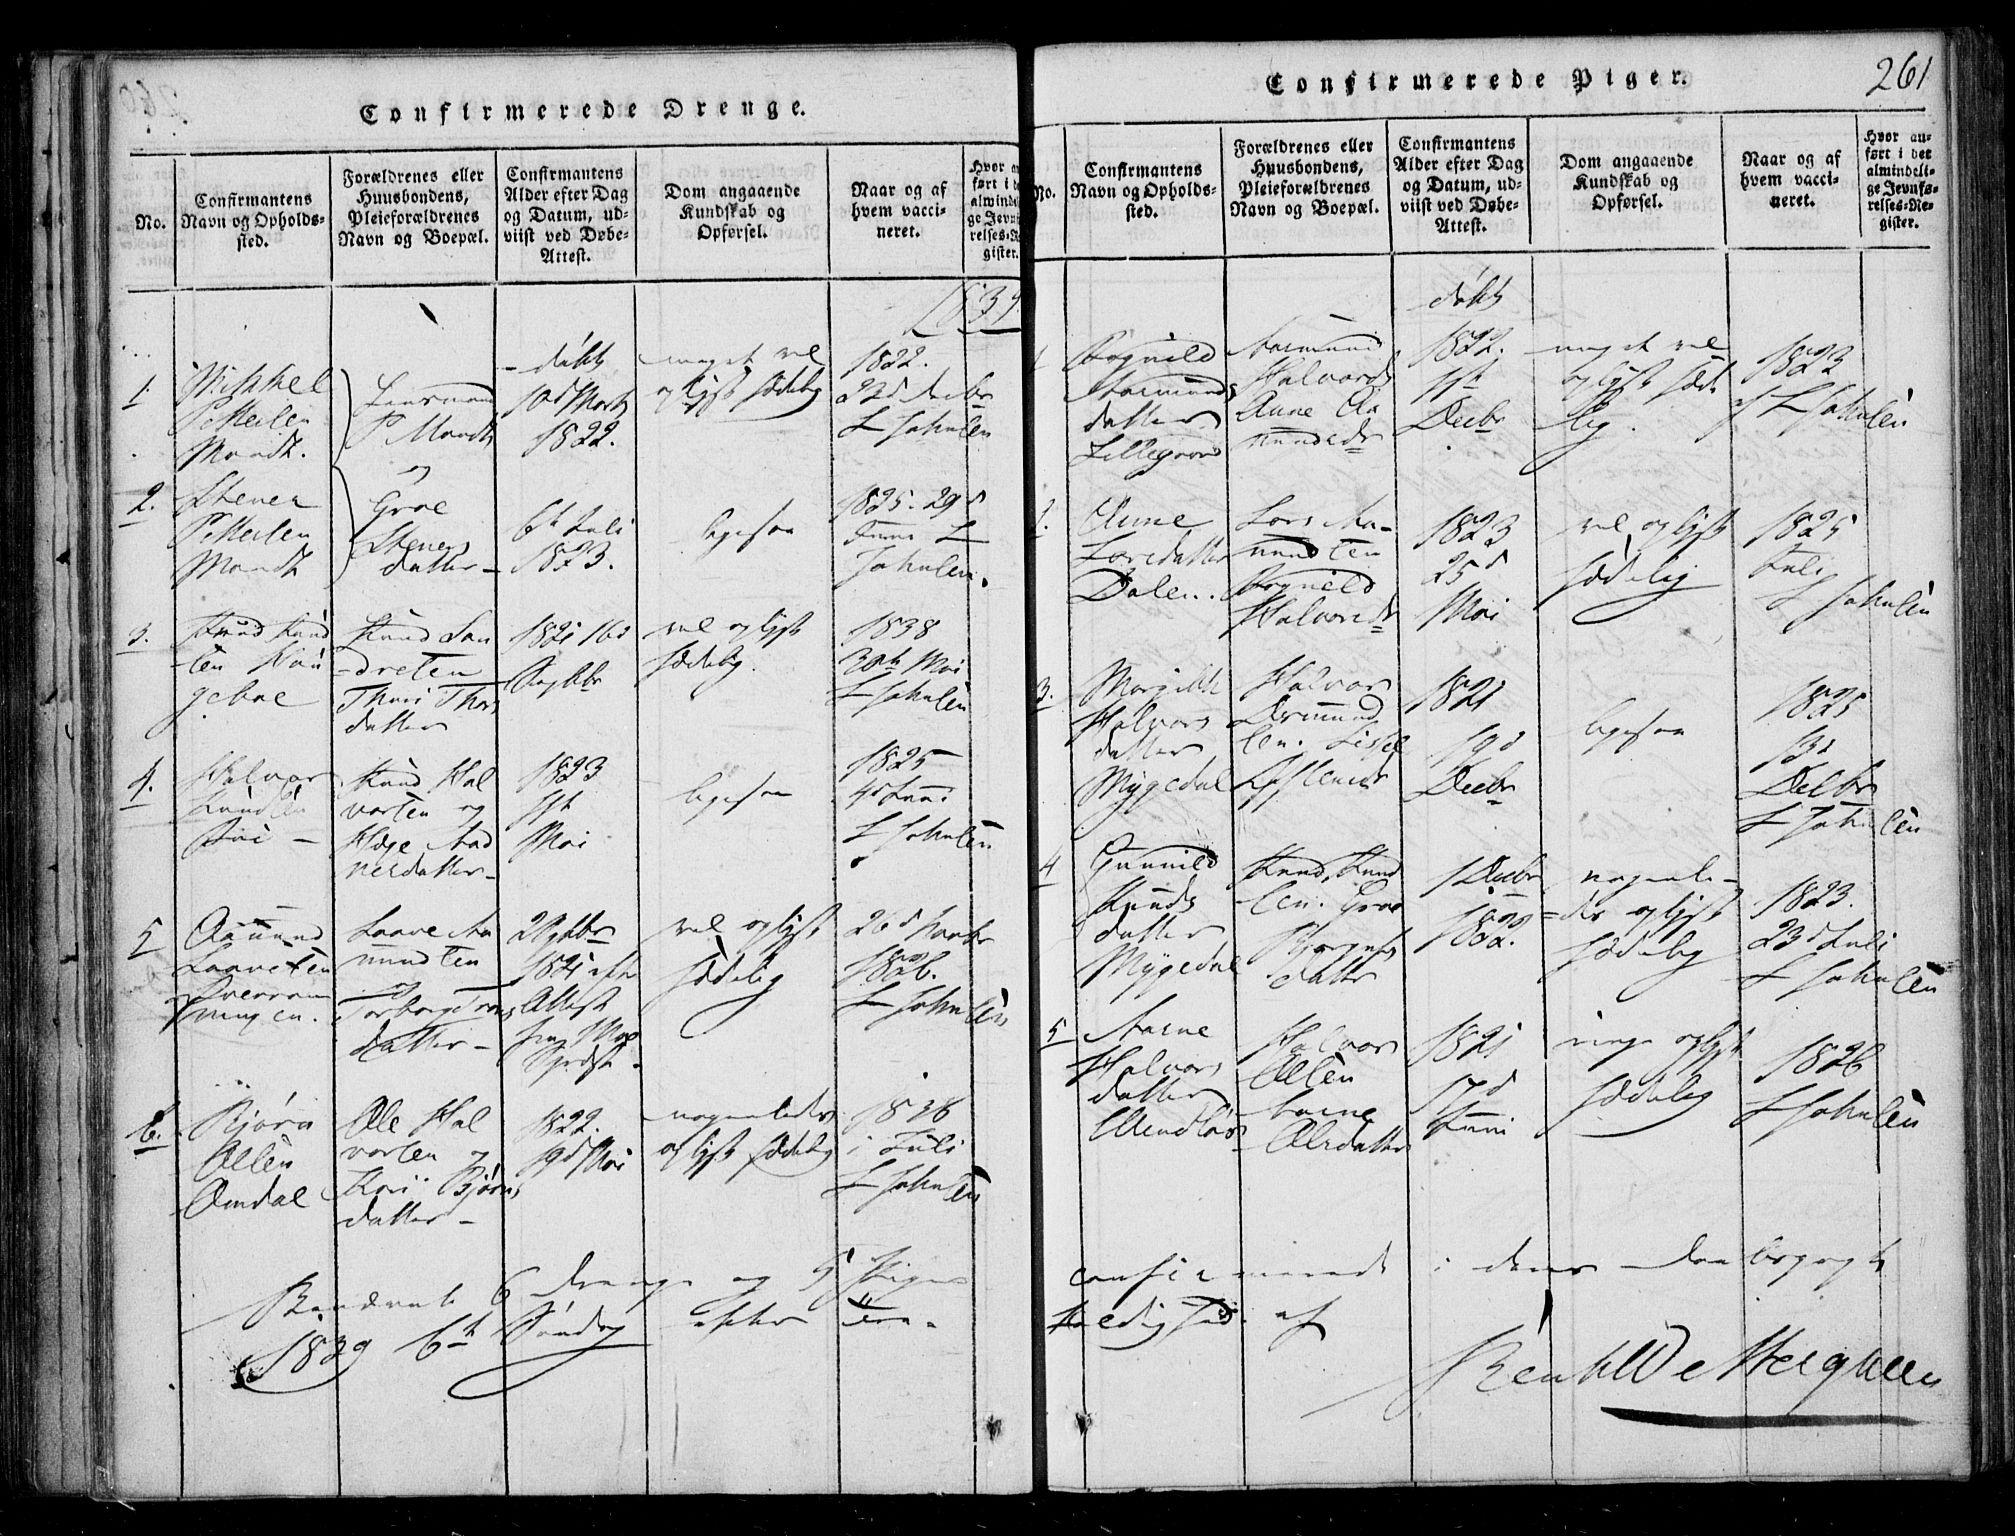 SAKO, Lårdal kirkebøker, F/Fb/L0001: Ministerialbok nr. II 1, 1815-1860, s. 261